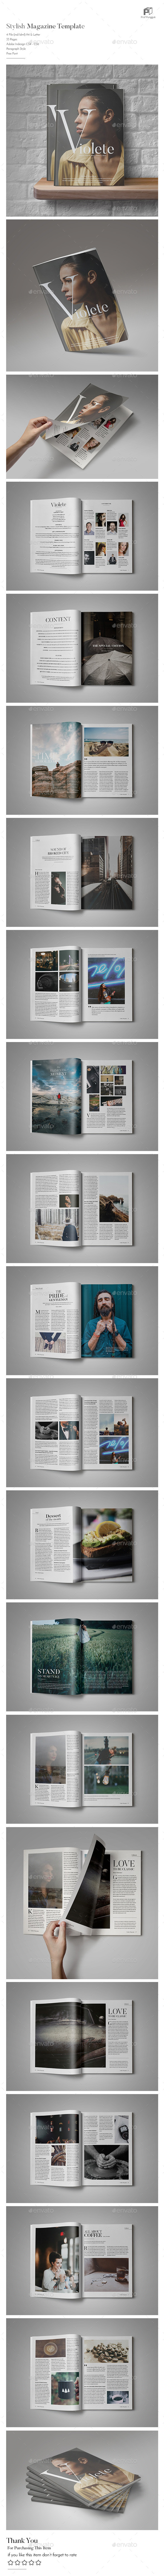 Stylish Magazine Vol.4 - Magazines Print Templates